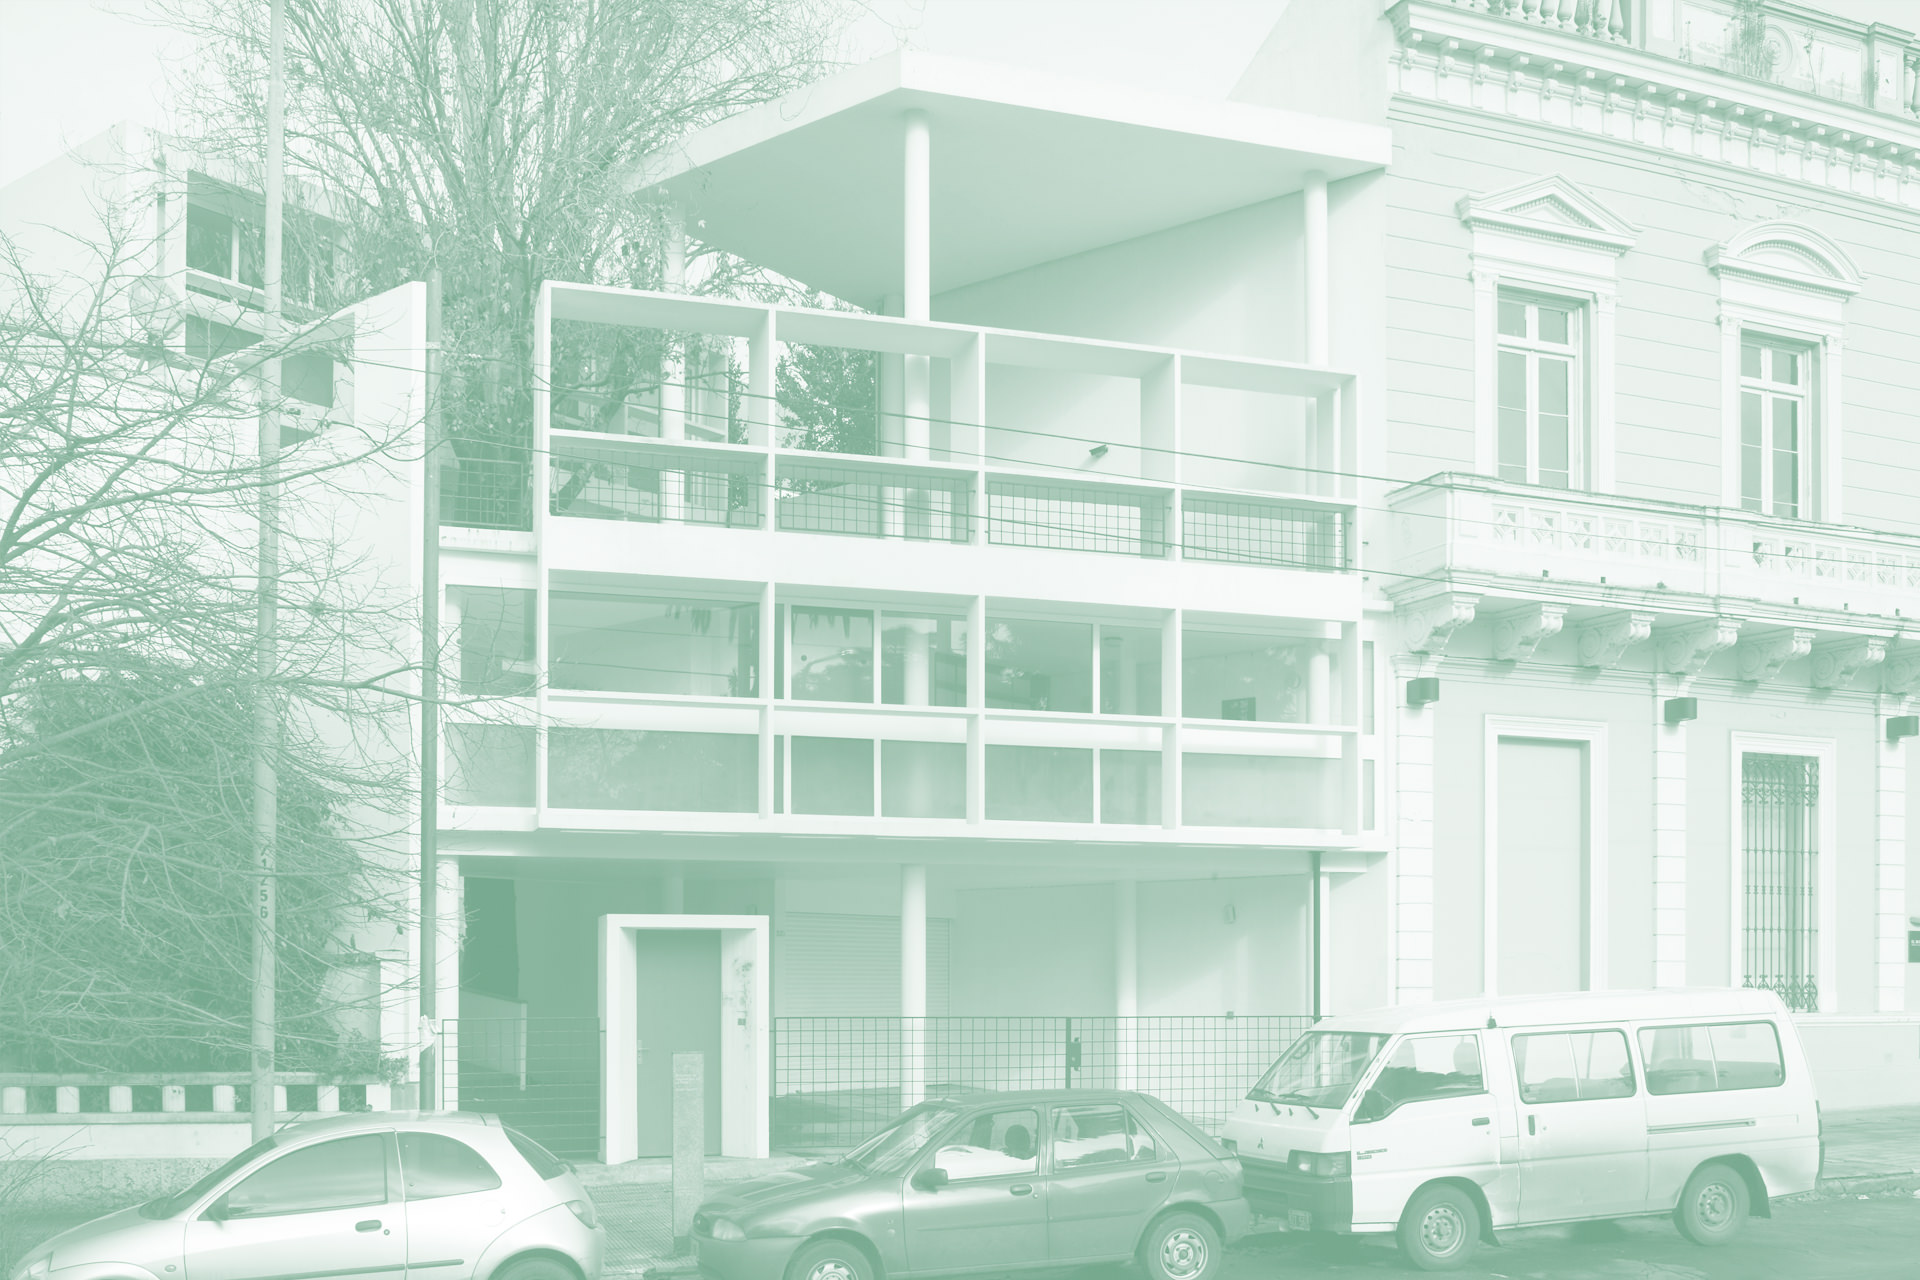 Unite D Habitation Le Corbusier World Heritage